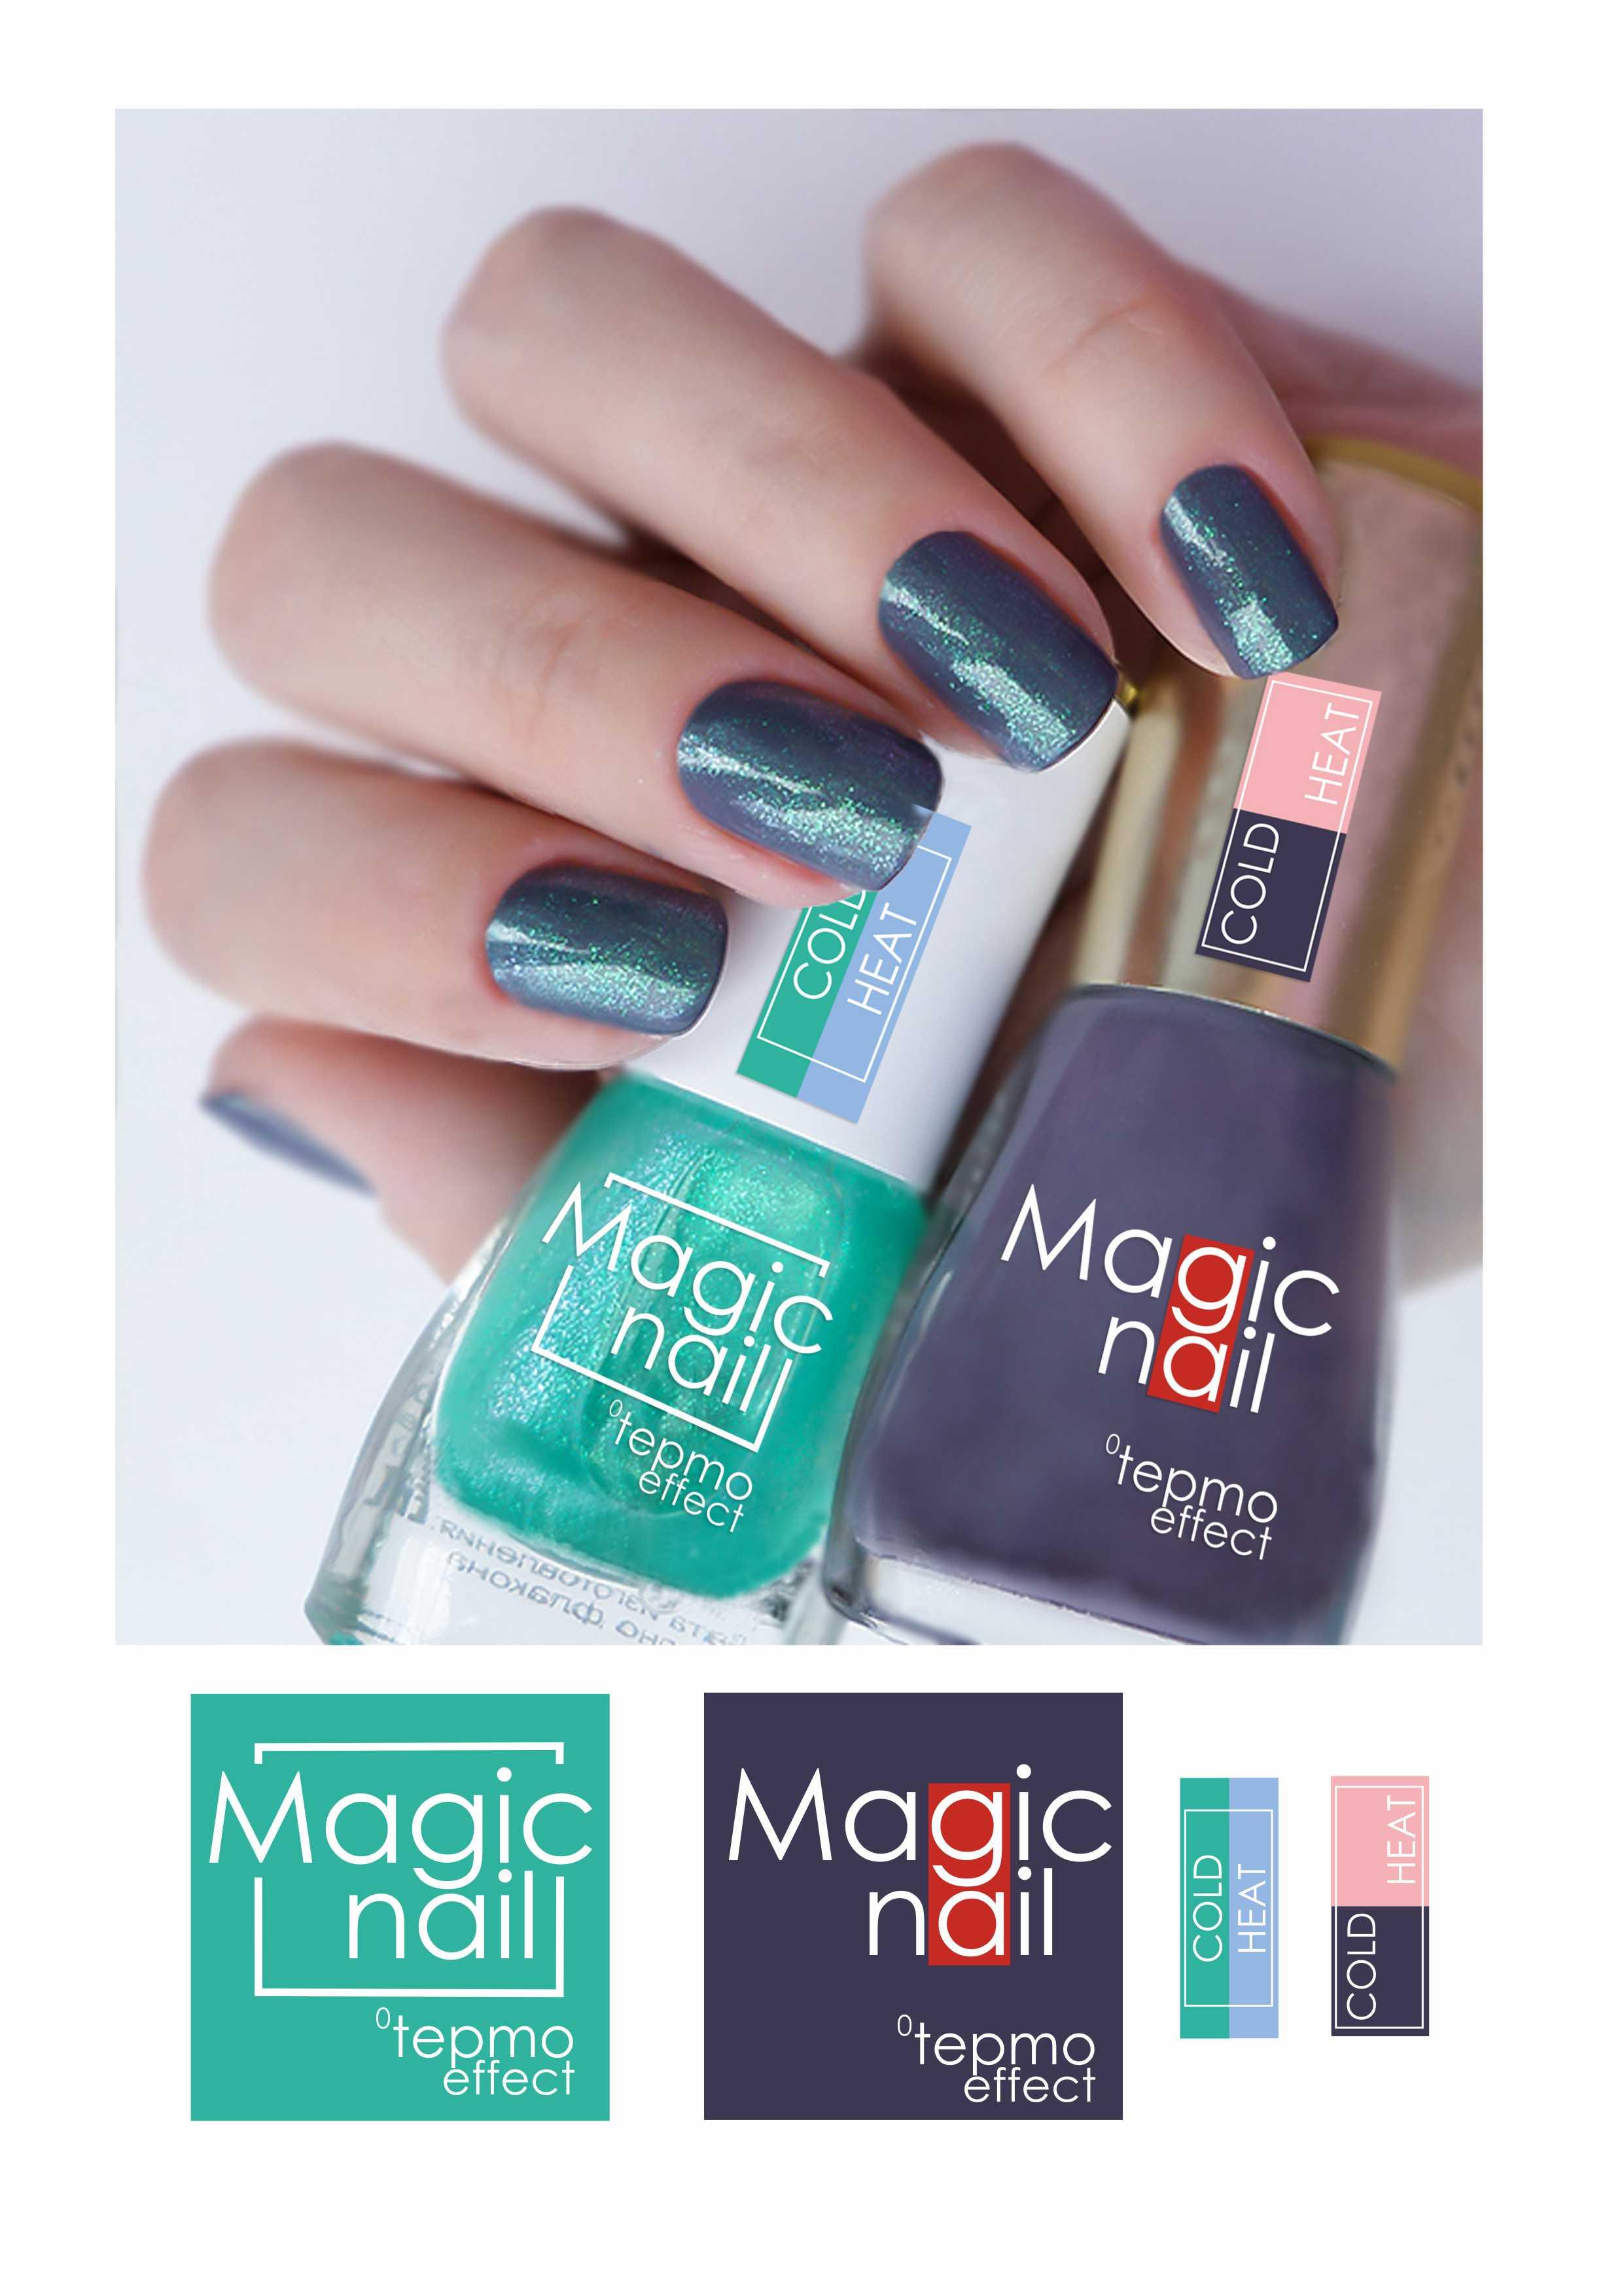 Дизайн этикетки лака для ногтей и логотип! фото f_9755a0d8eaa984fd.jpg